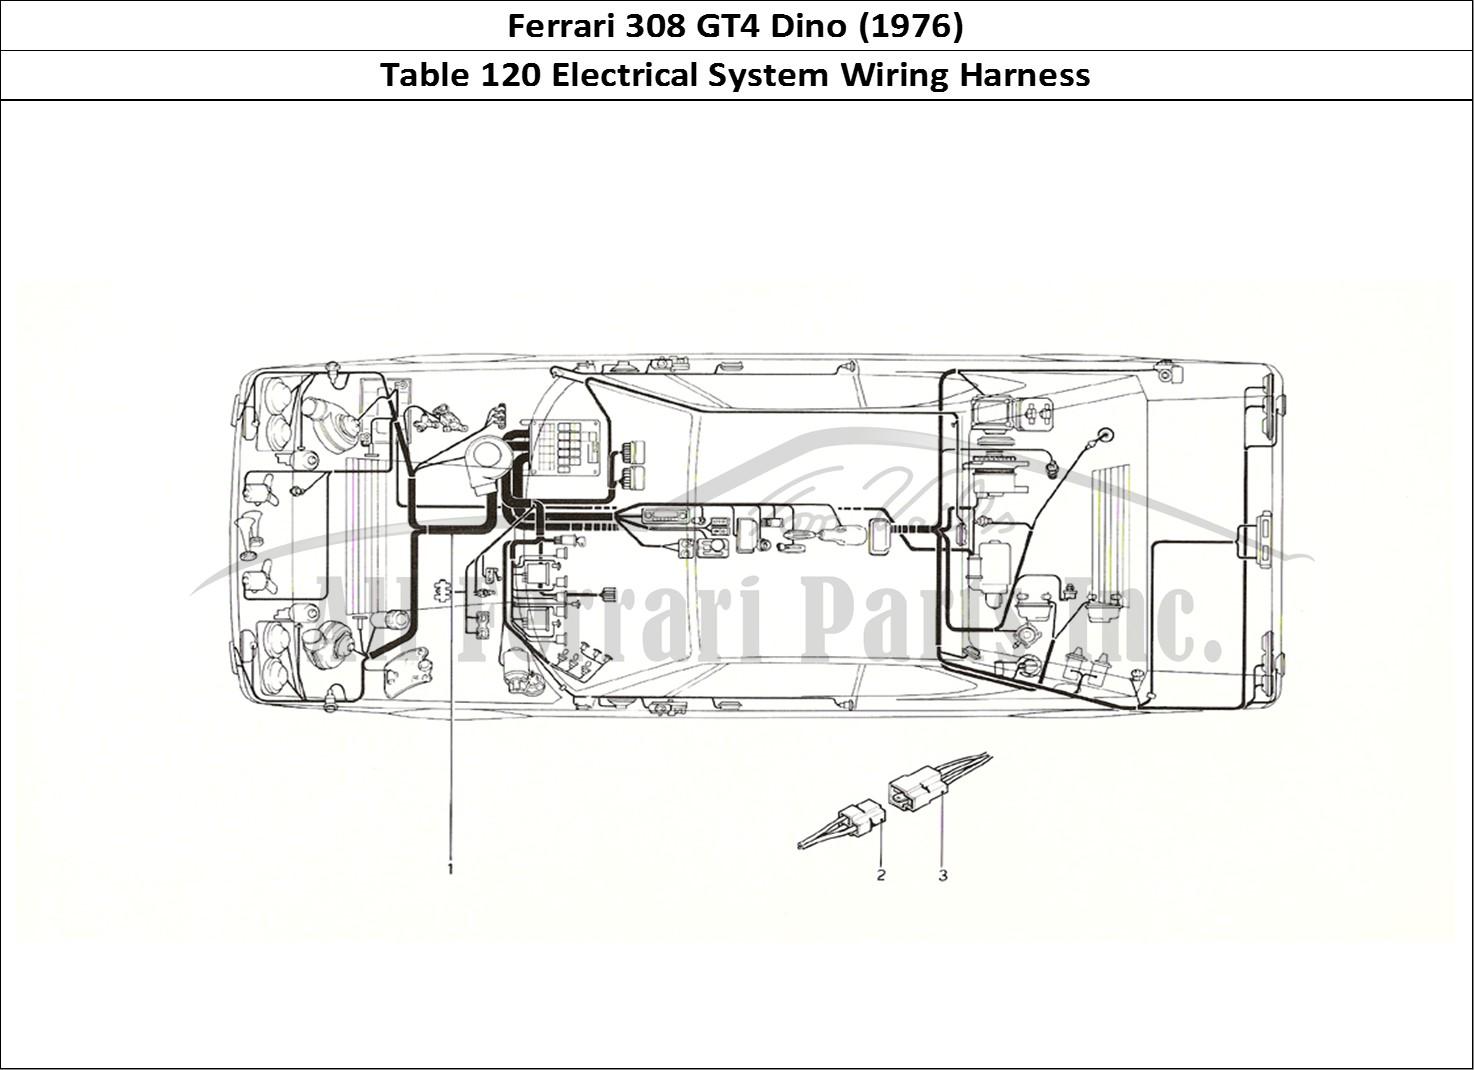 Buy Original Ferrari 308 Gt4 Dino  1976  120 Electrical